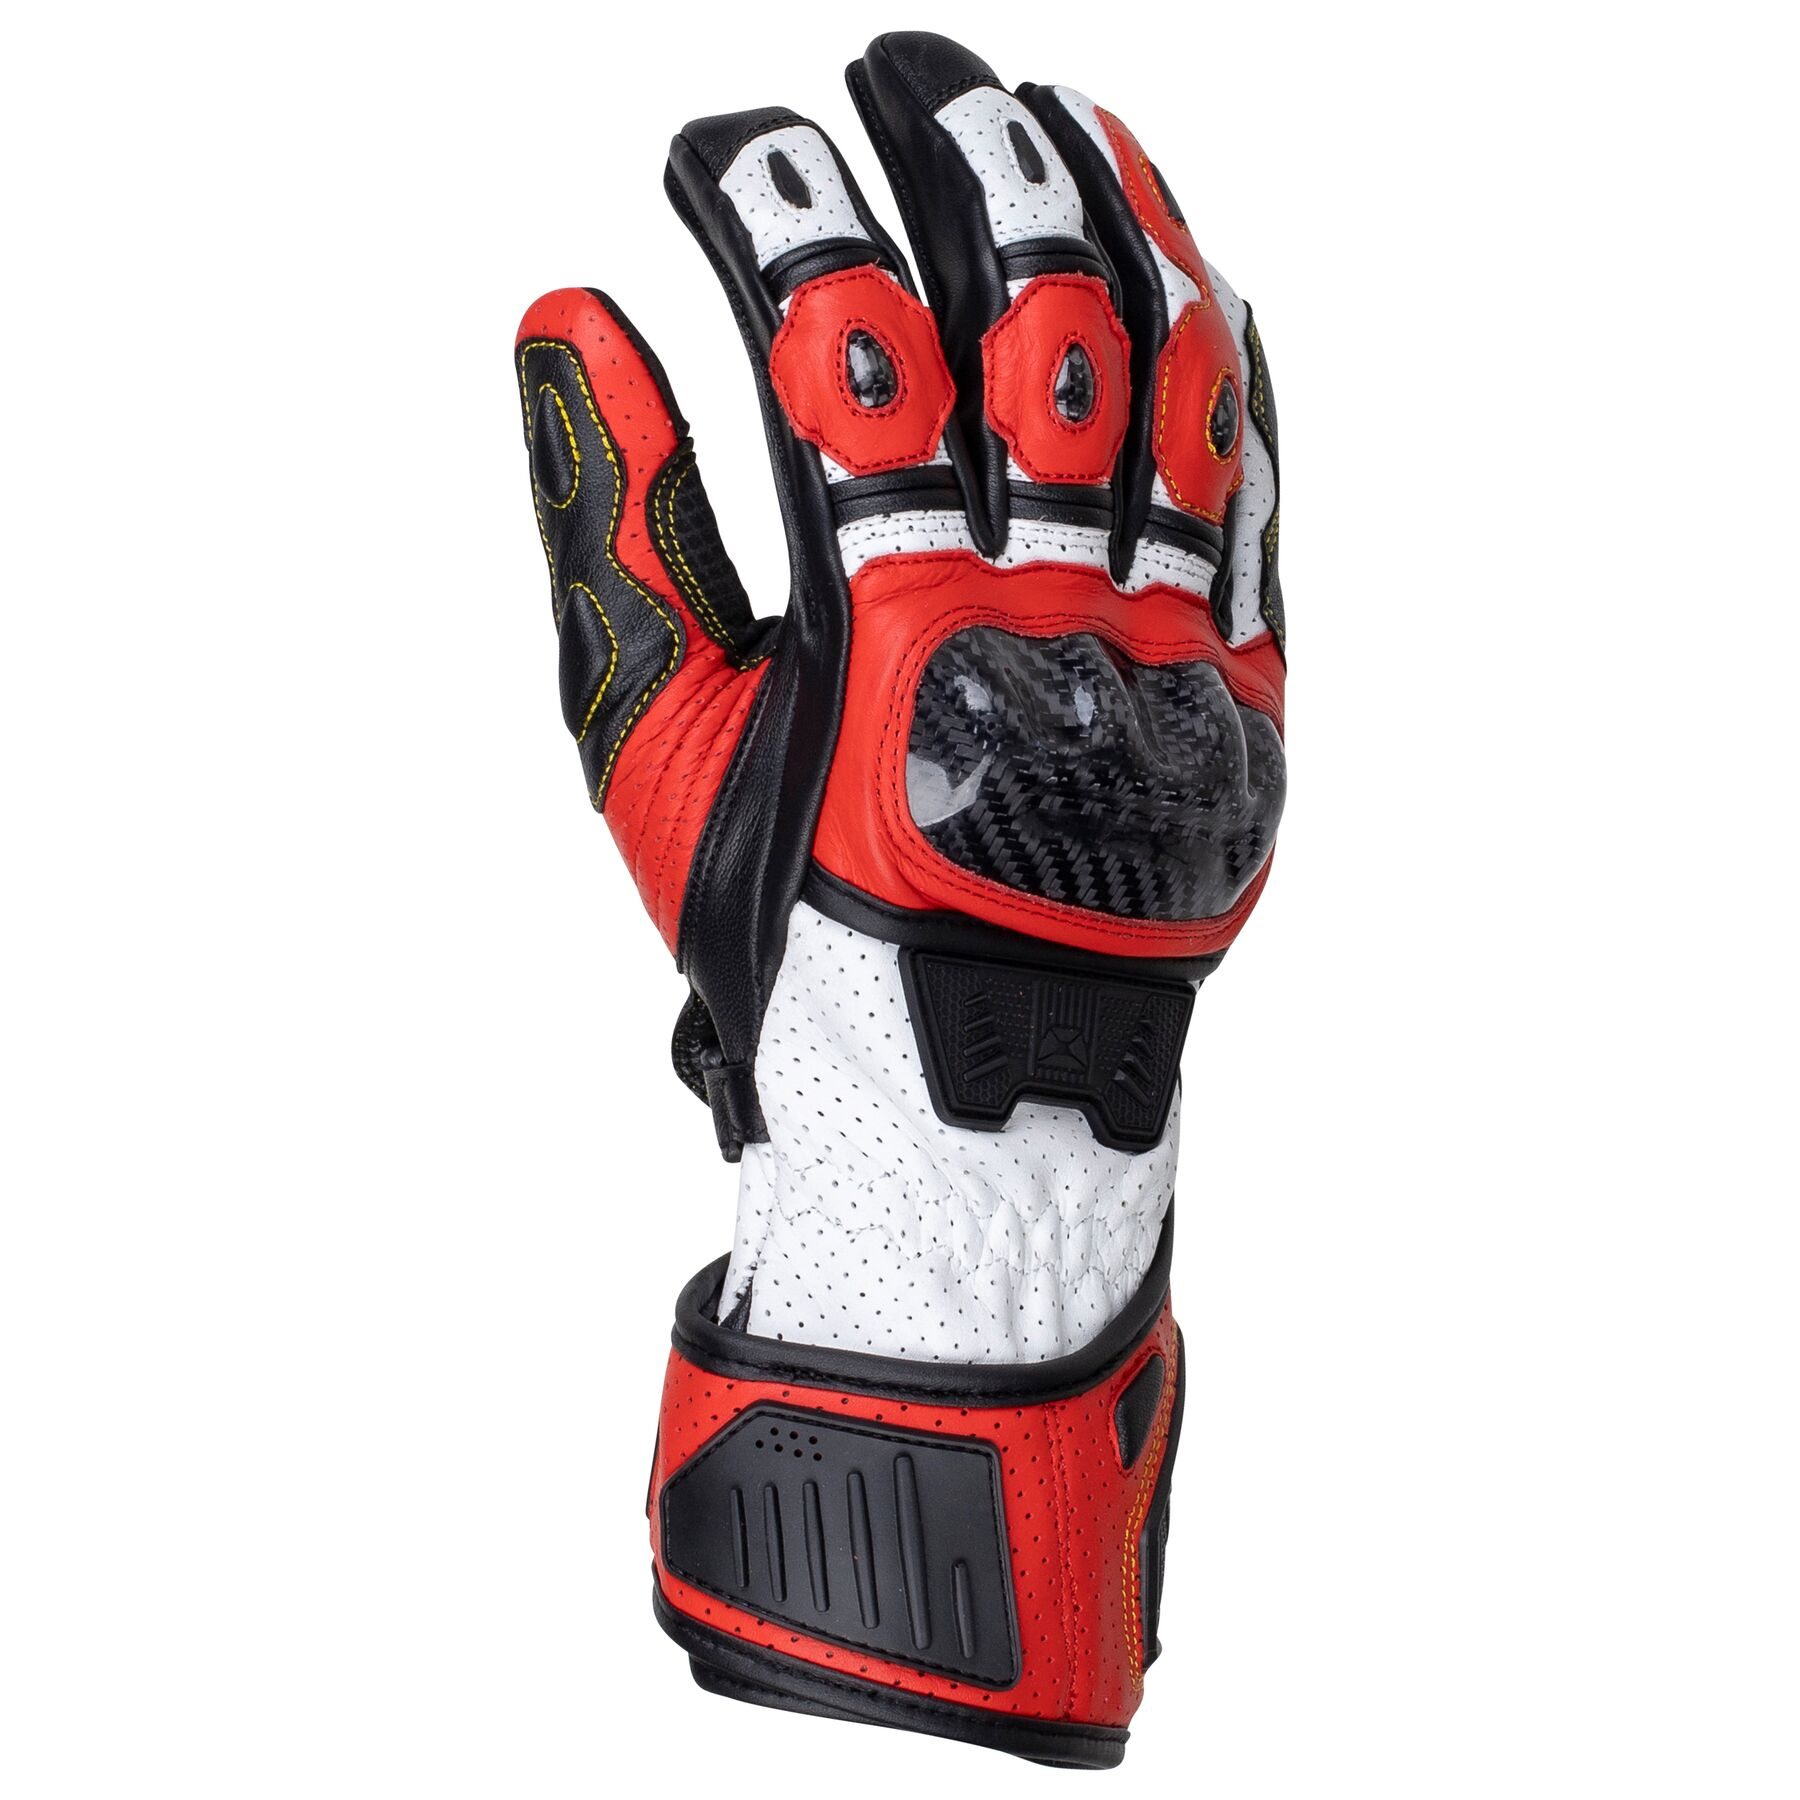 Cortech Apex RR Gloves